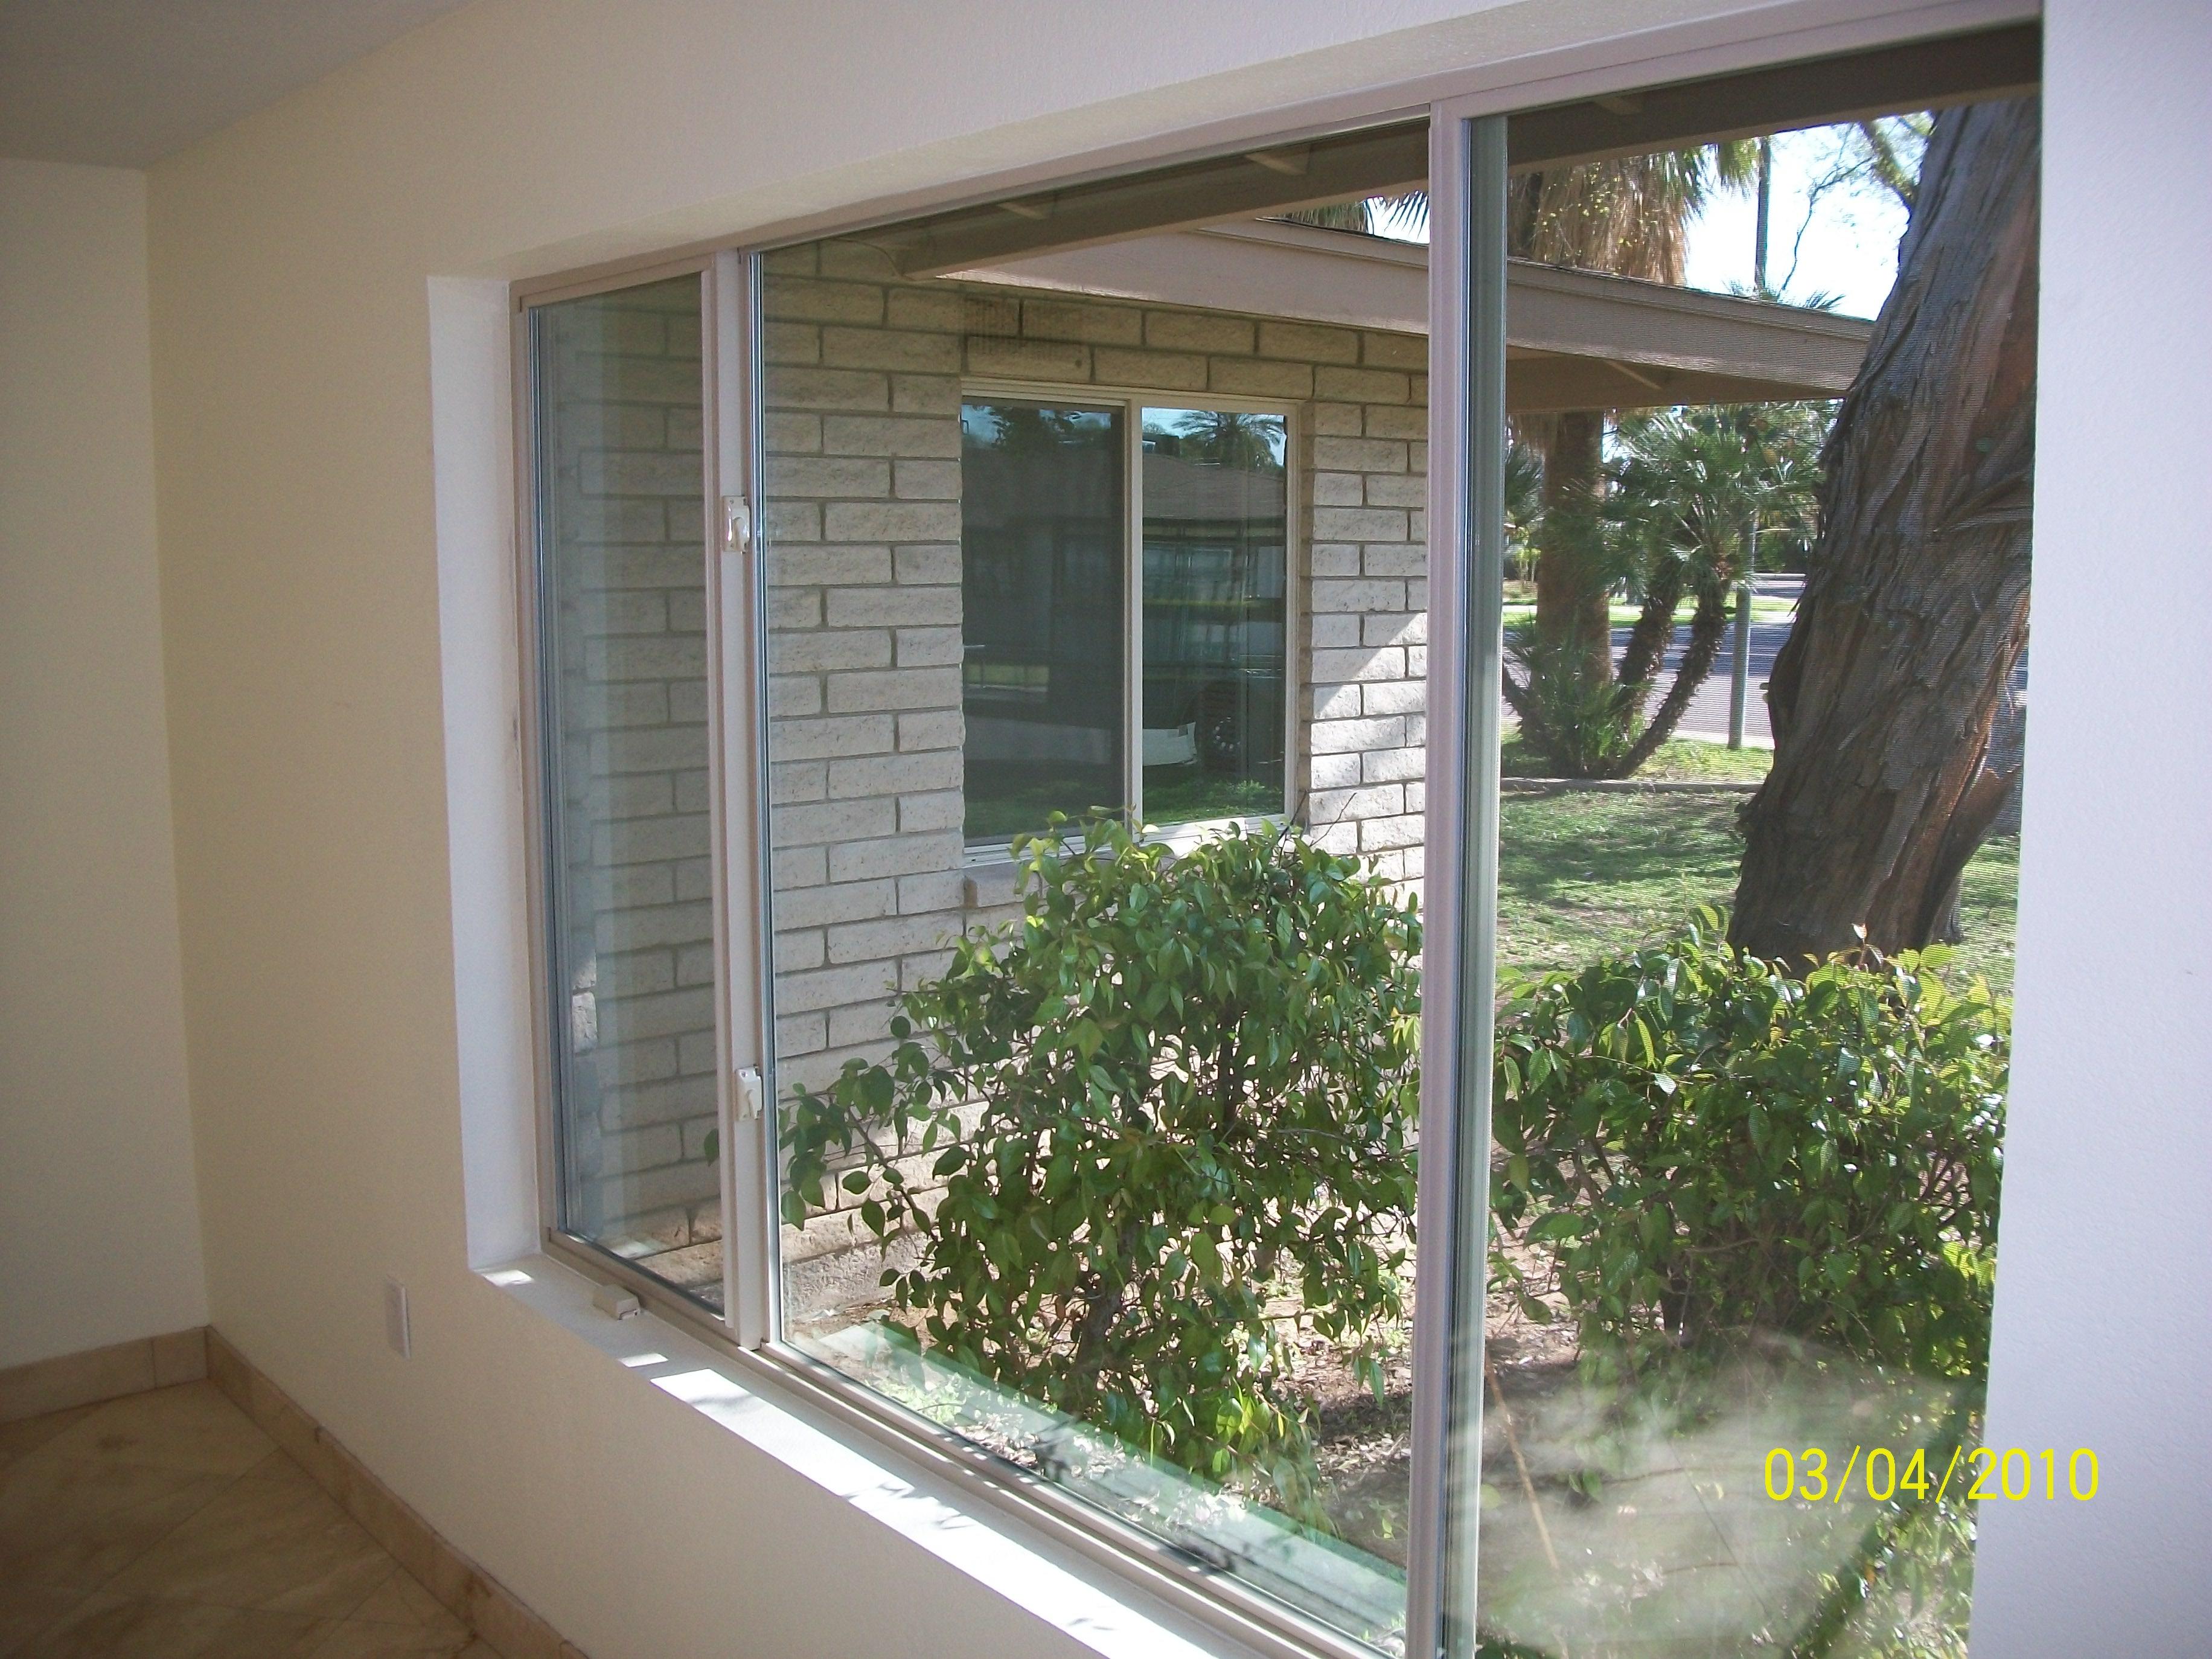 2748 #594B37 Arizona's Best Windows. Quality Replacement Windows & Doors picture/photo Best Quality Doors 39593664